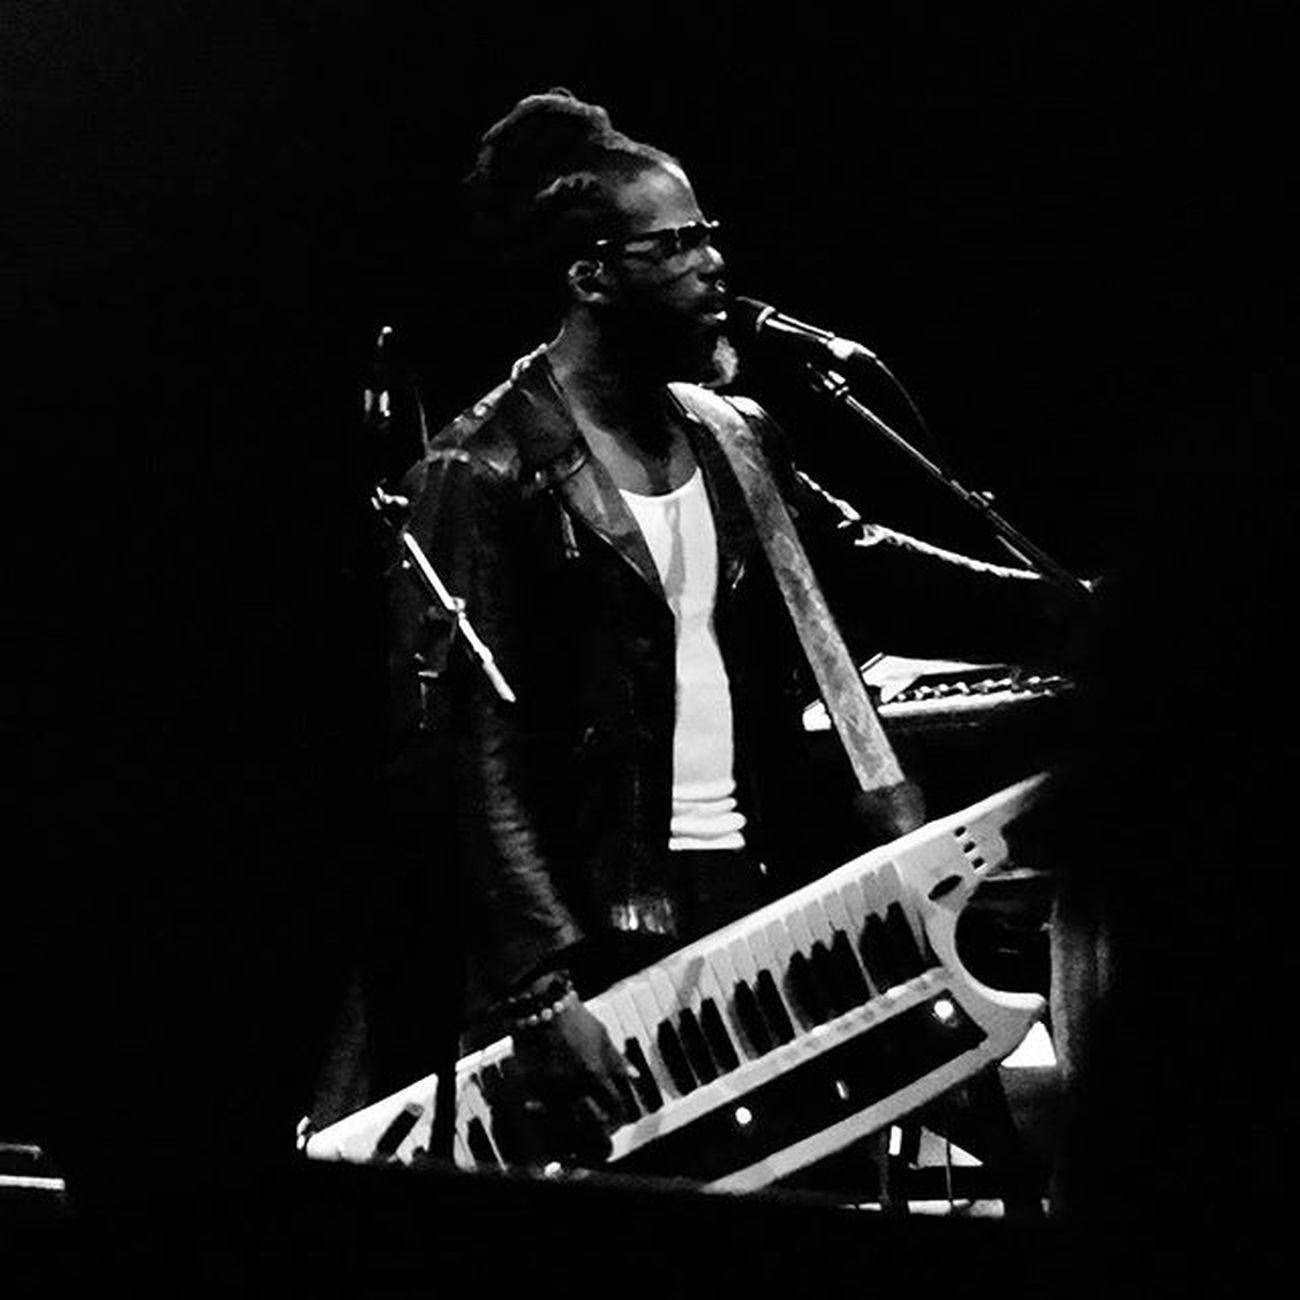 Jazz Musician Robertglasper Bluenote Bluenoterecords Southbank Jazzfestival Blackmusician Cool Lovelive Caravaggio Caravagio Rembrandt